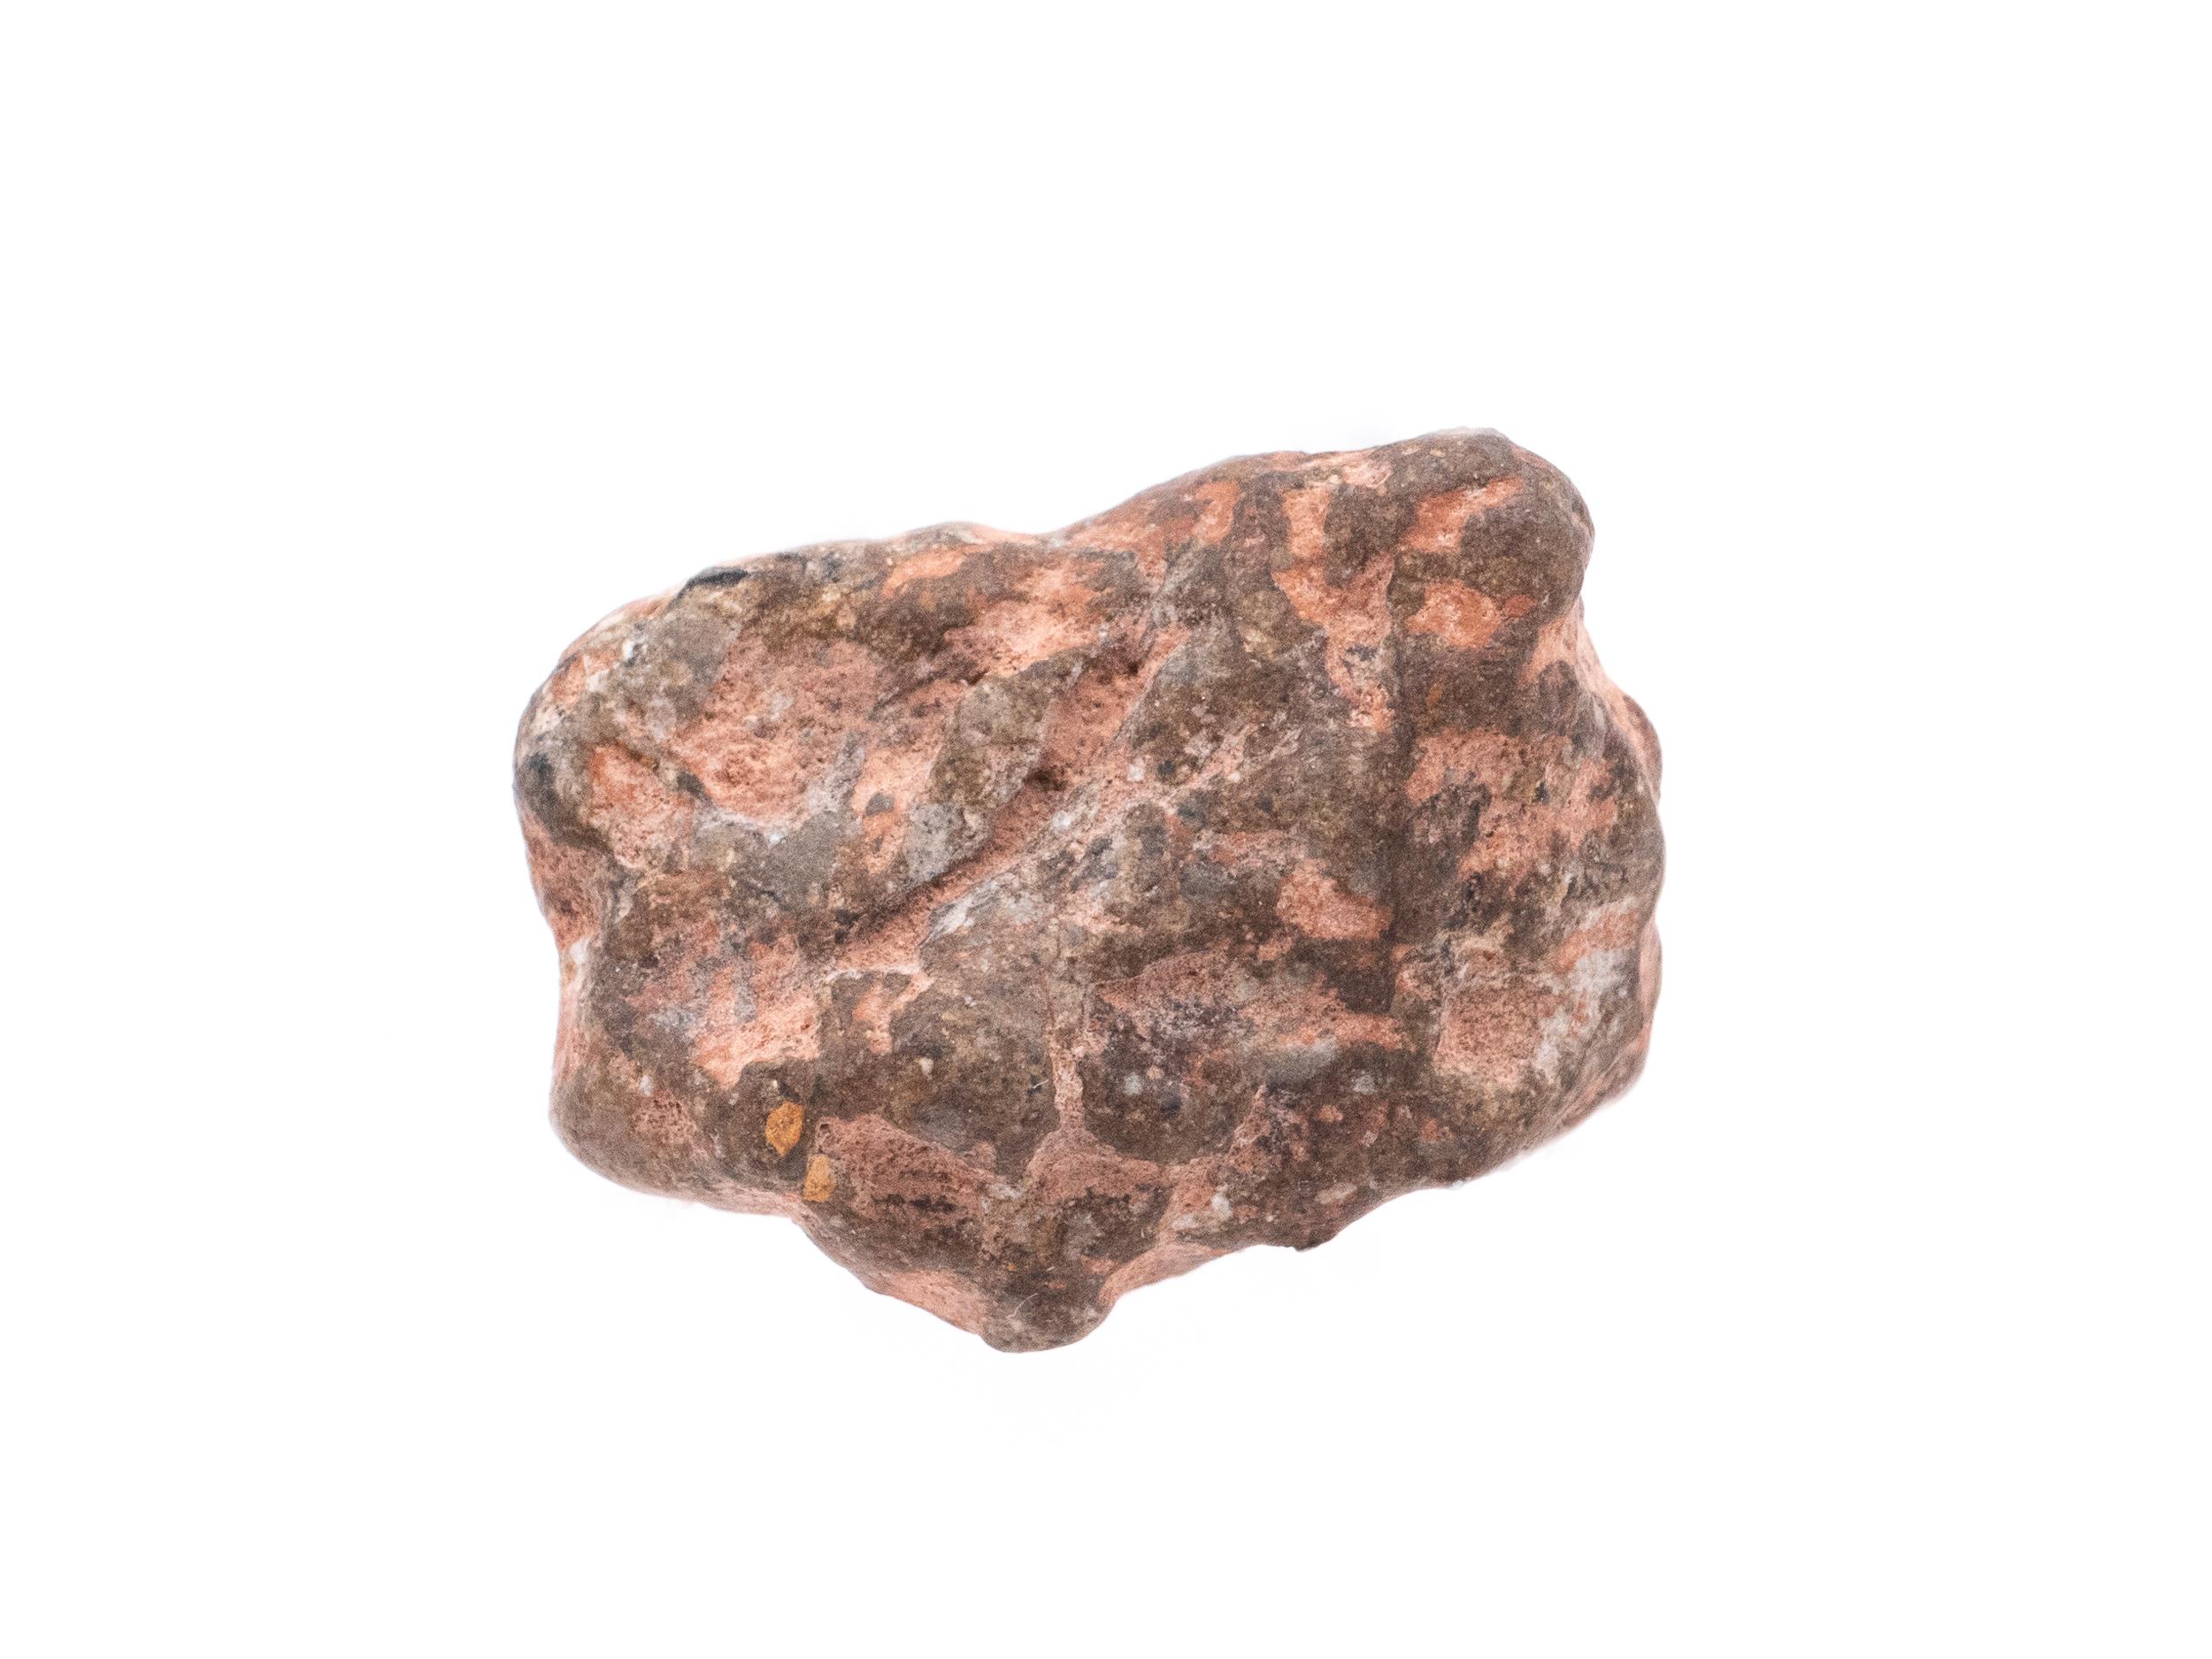 lunar meteorite fragment